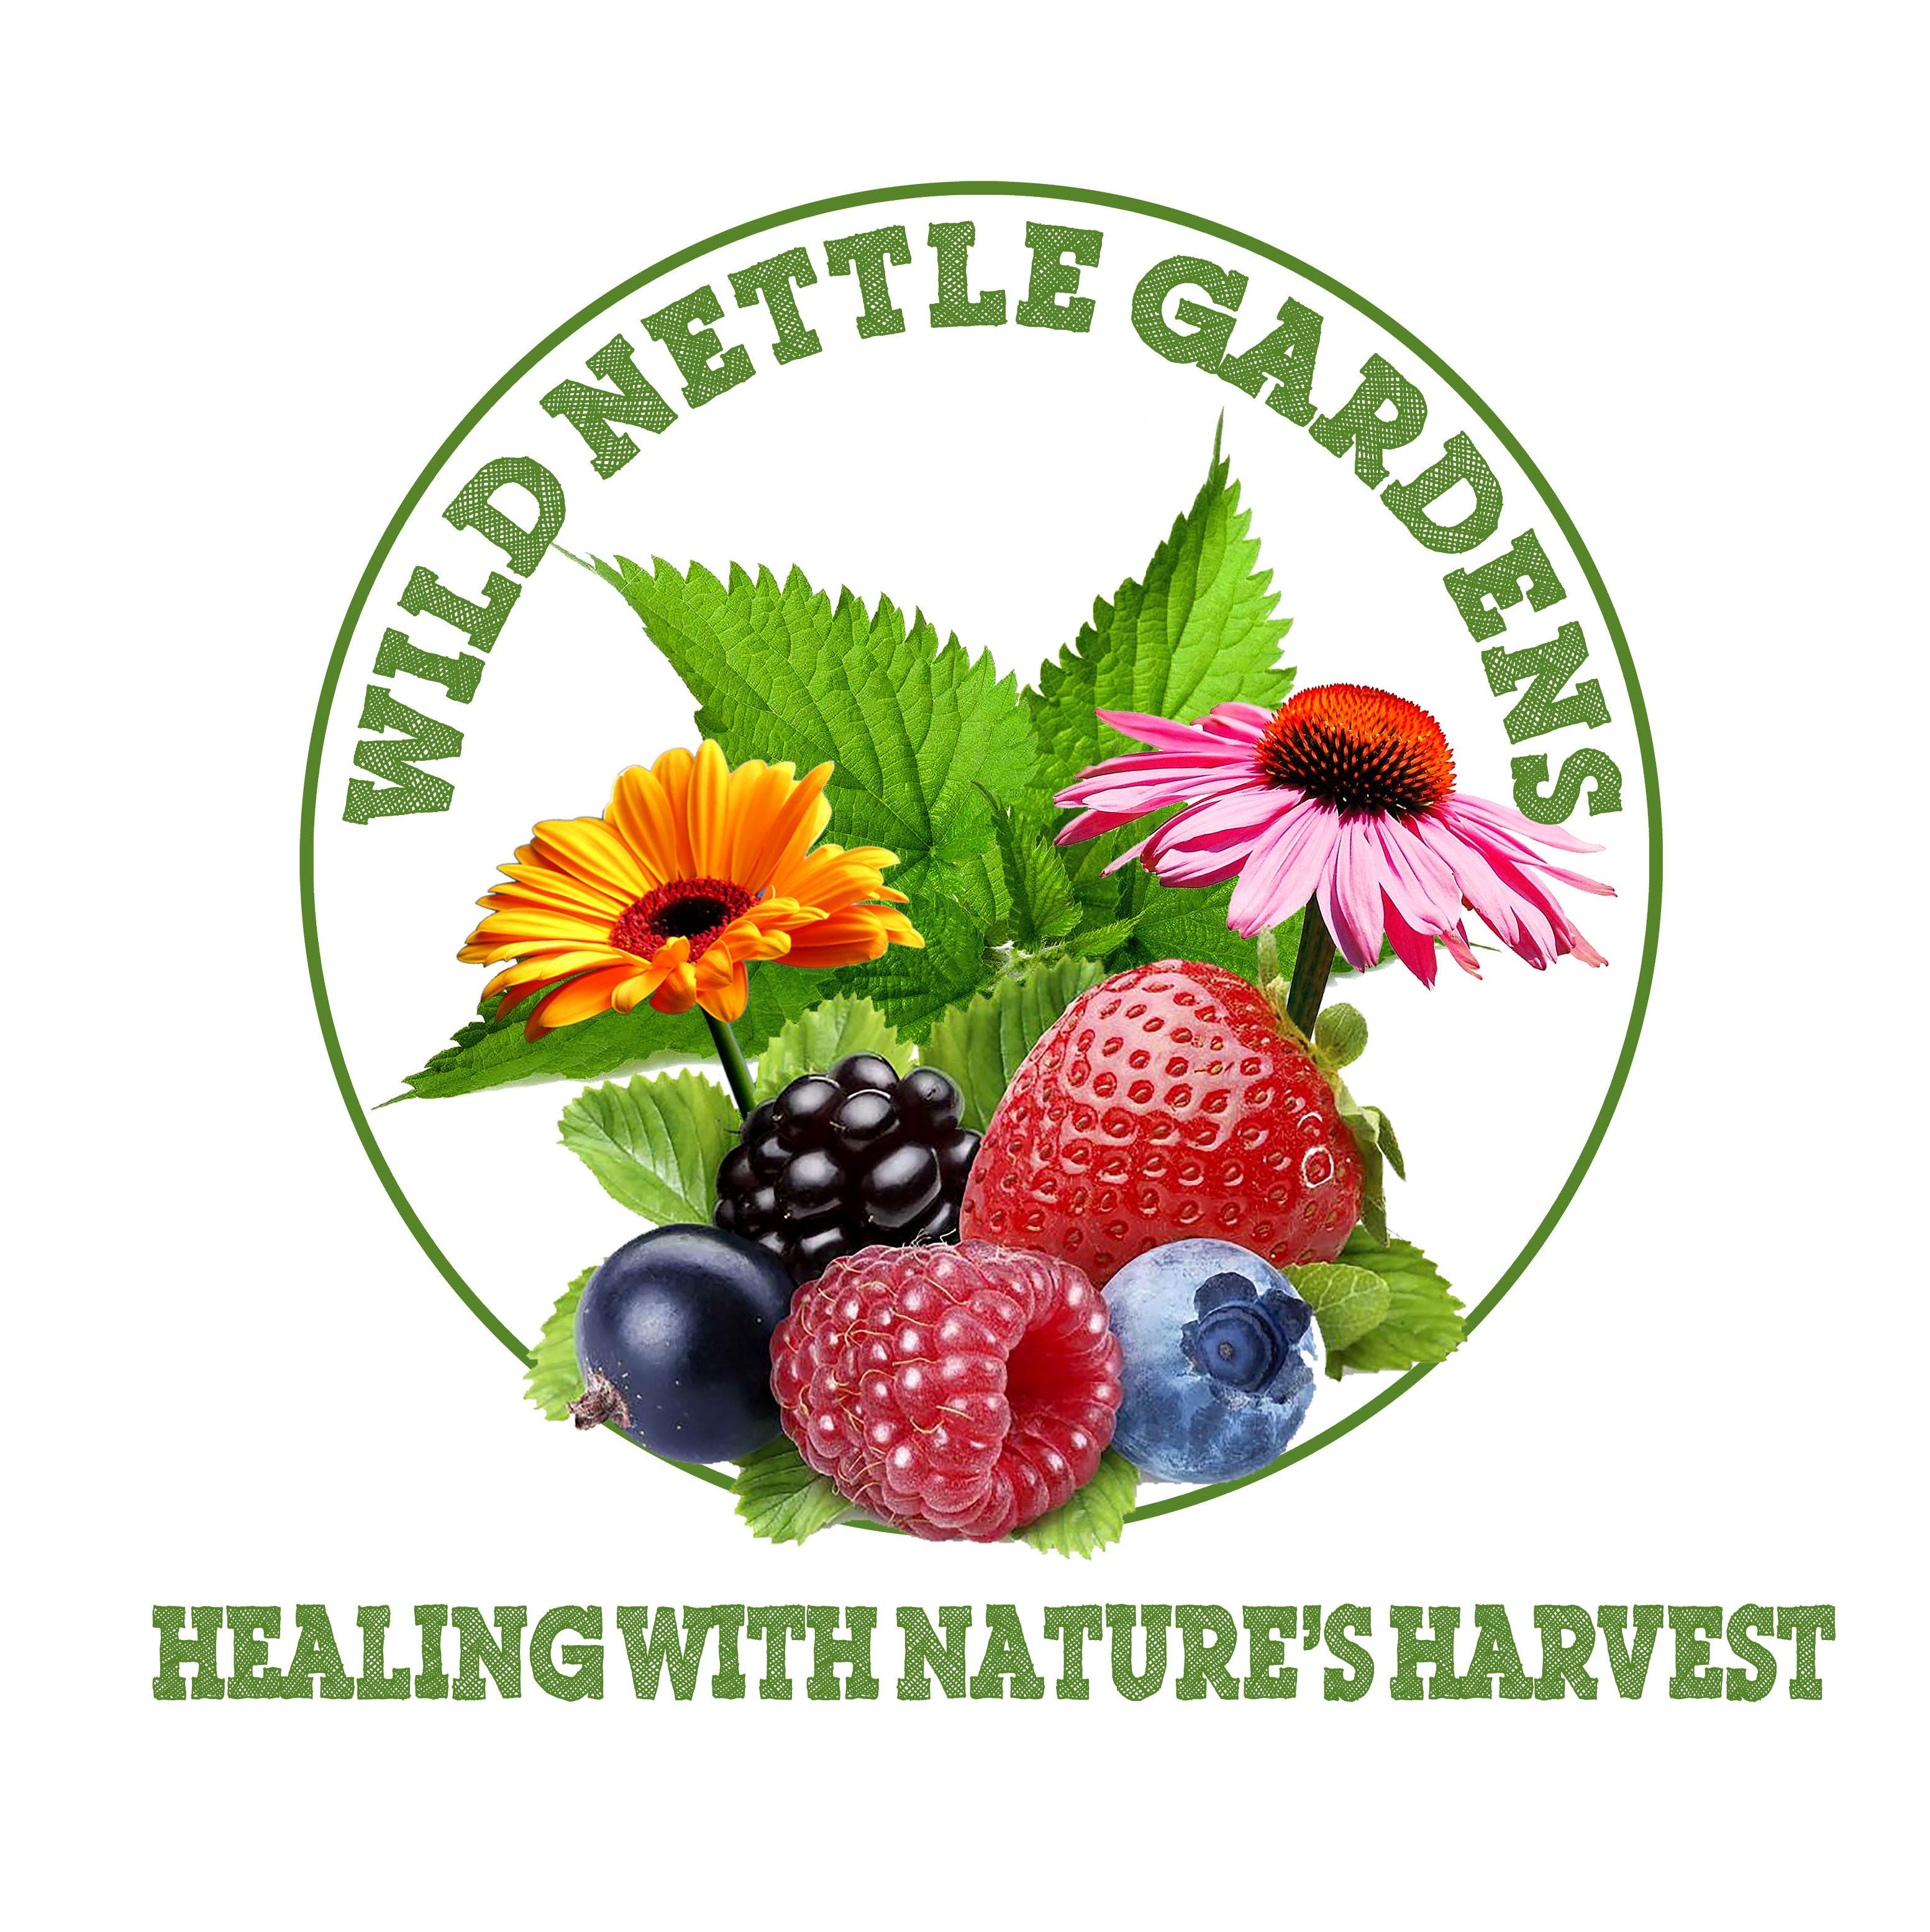 Wild Nettle Gardens